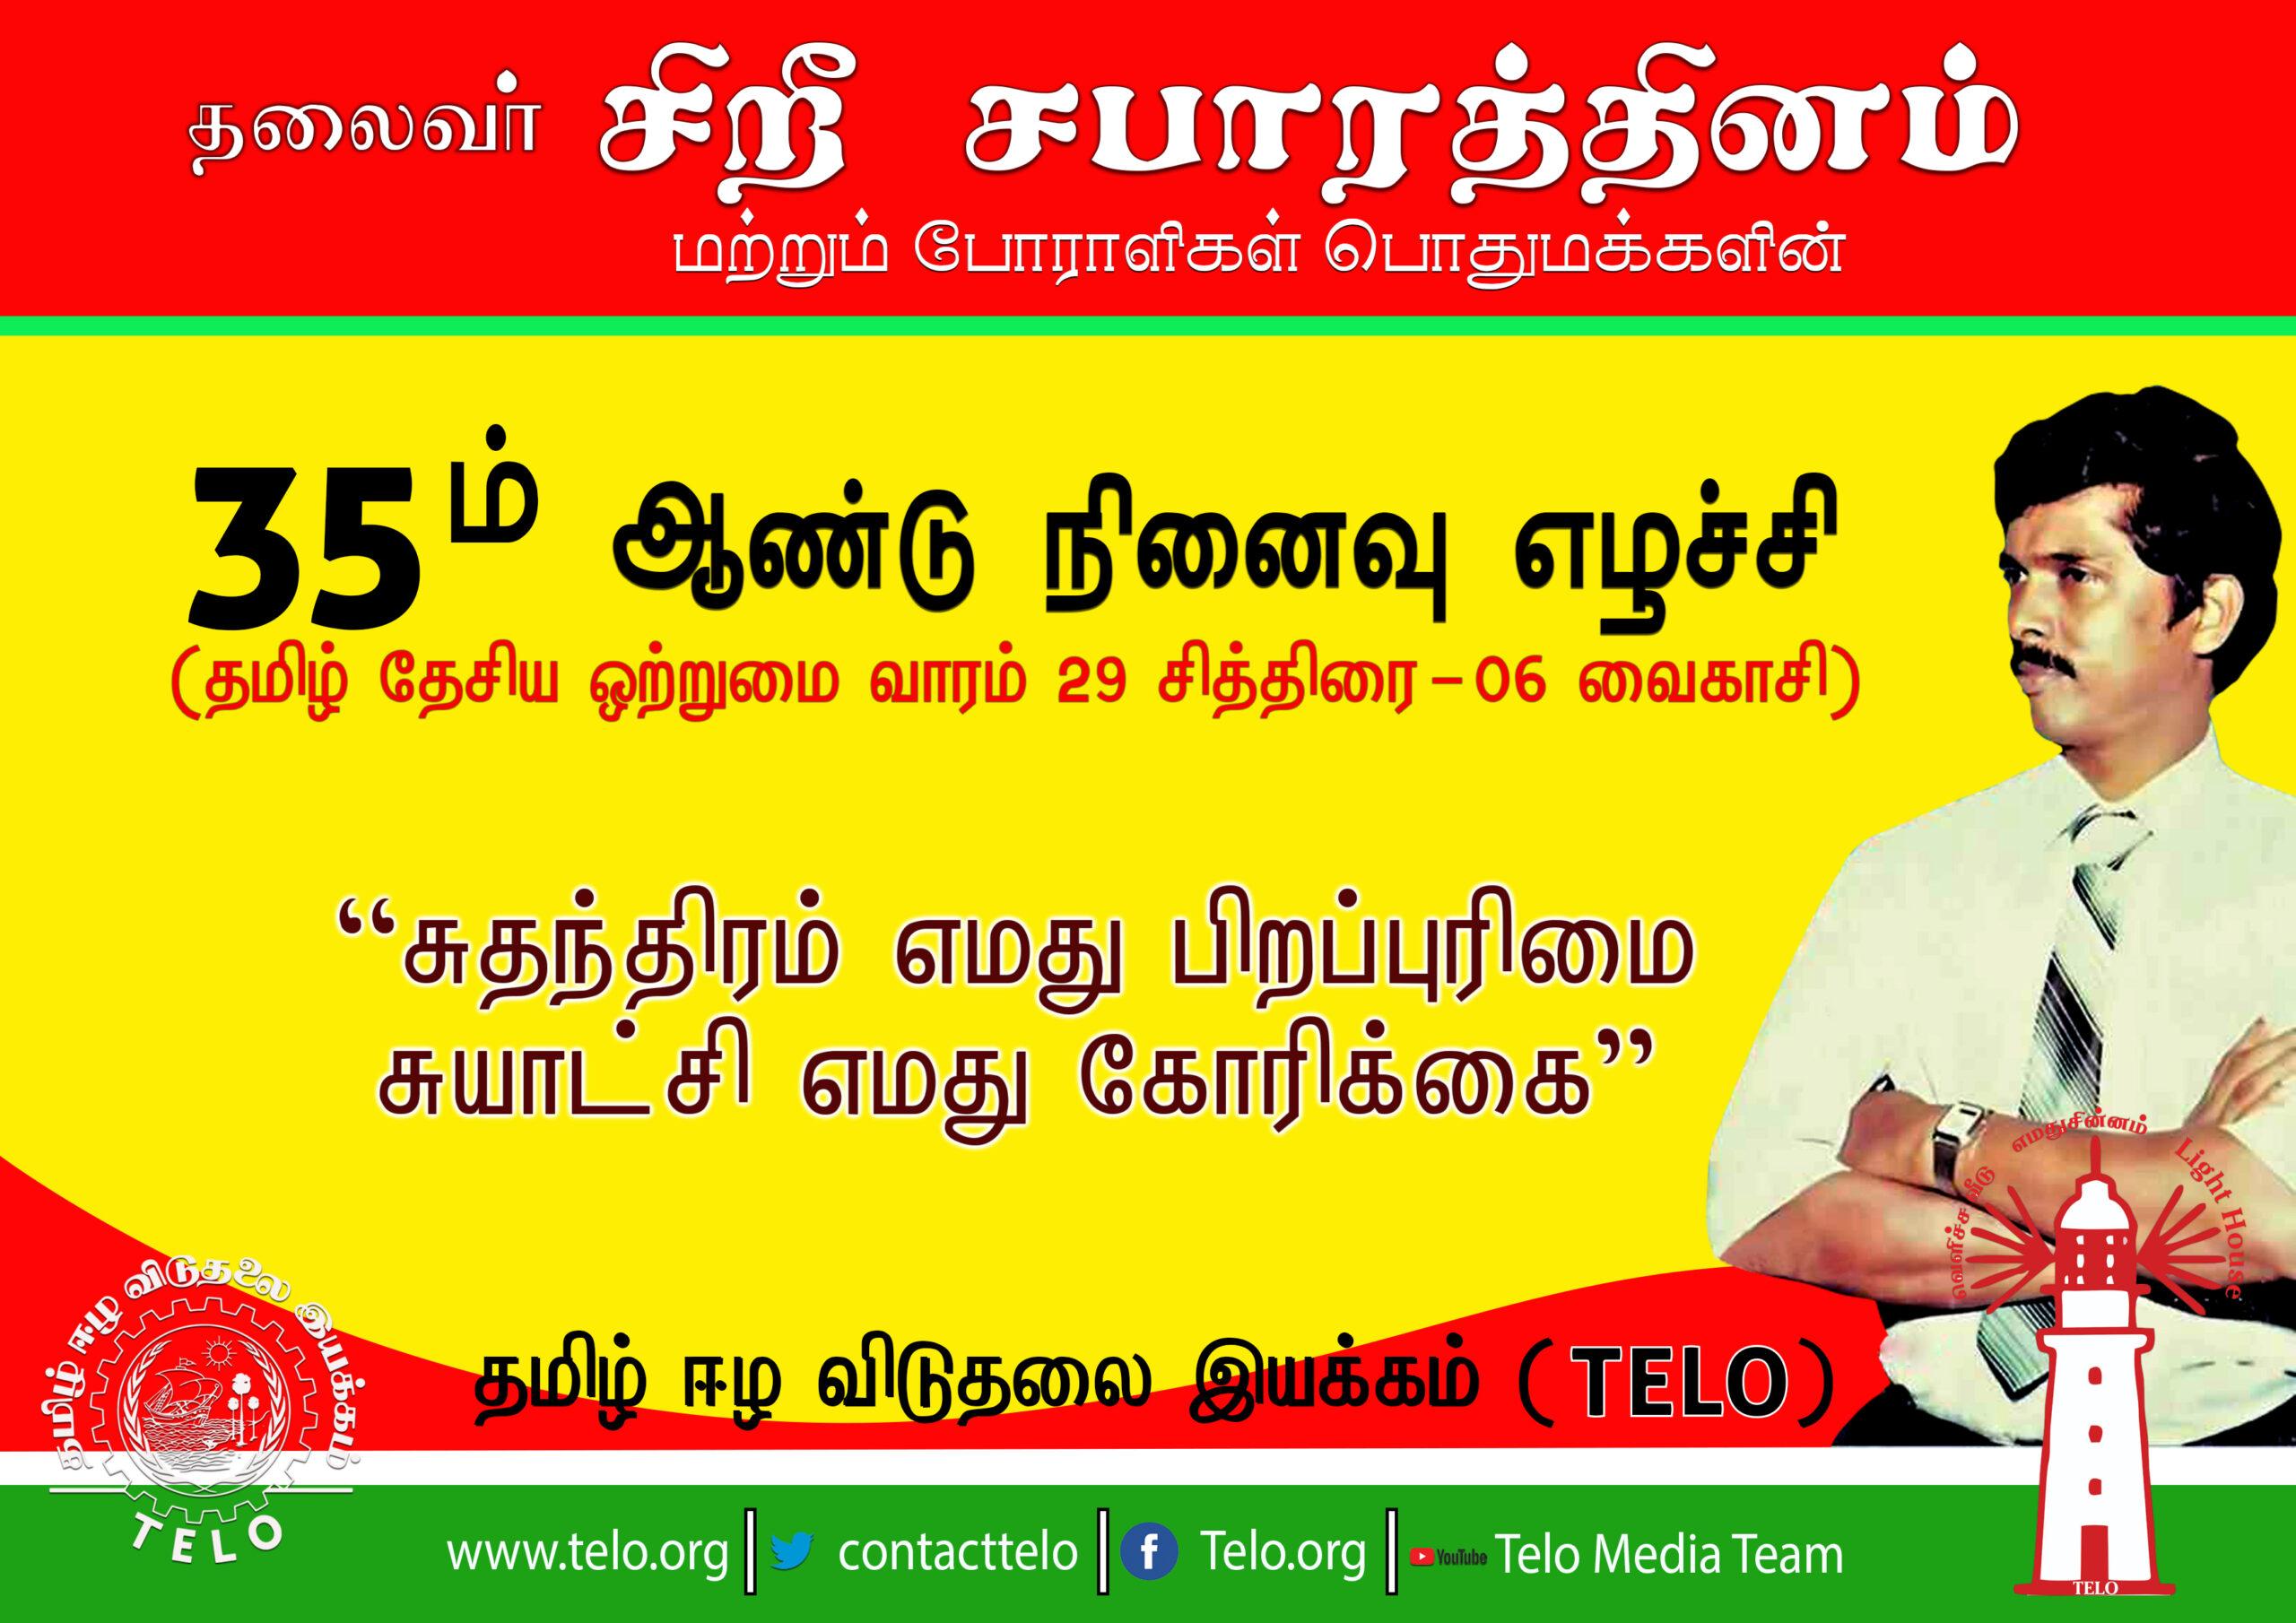 Telo Sri Anna 2021